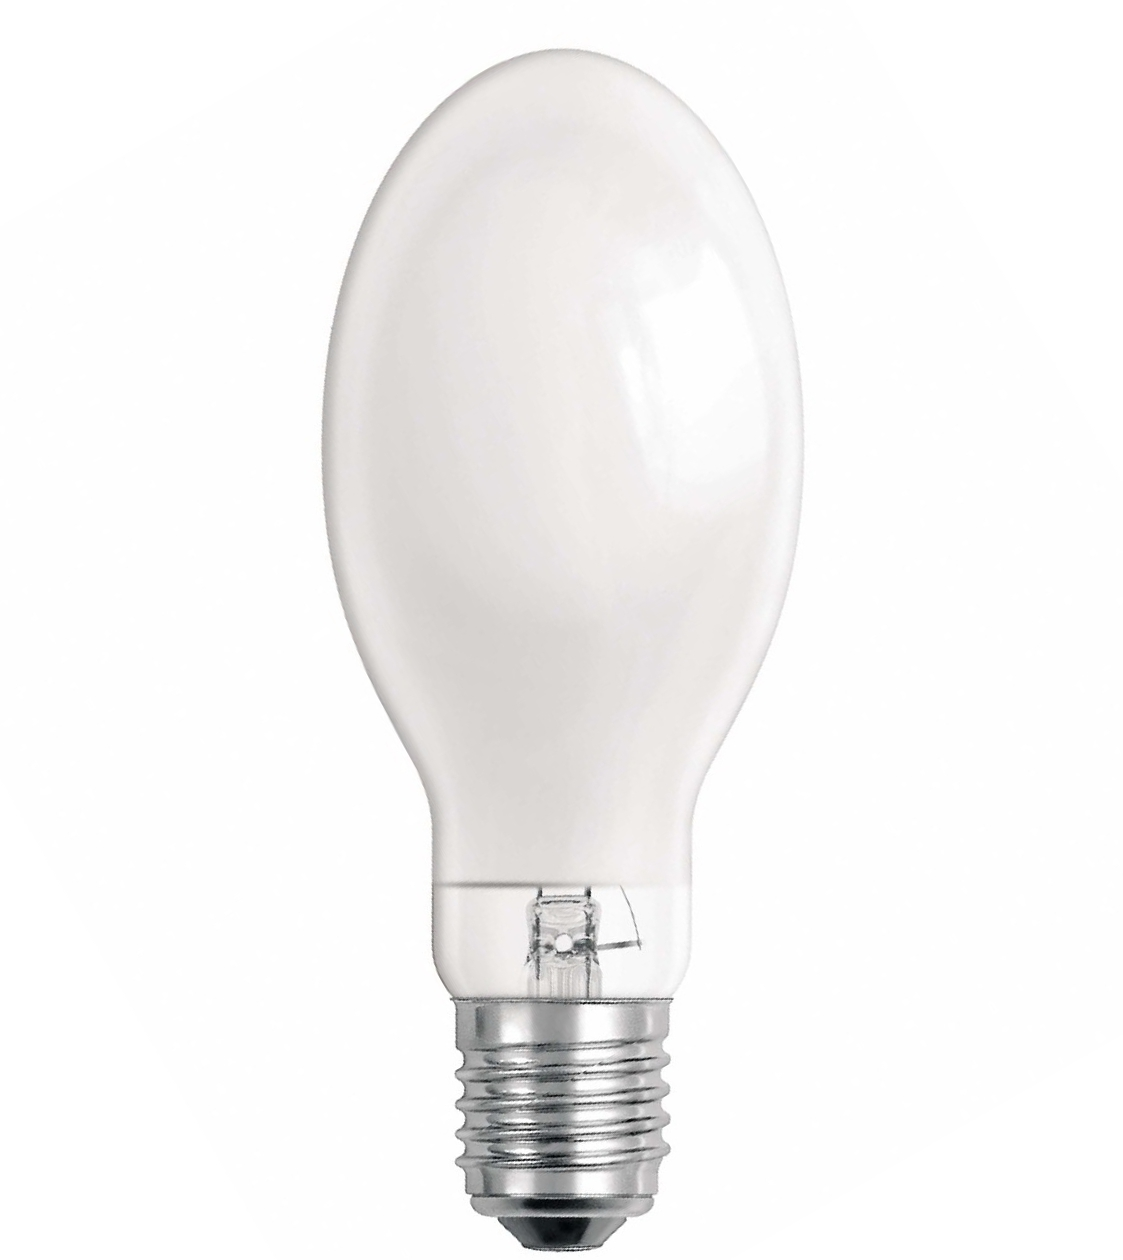 1 Stk HIE-P 70W/WDL COATED E27 FS1, Metalldampflampe LI5X397801